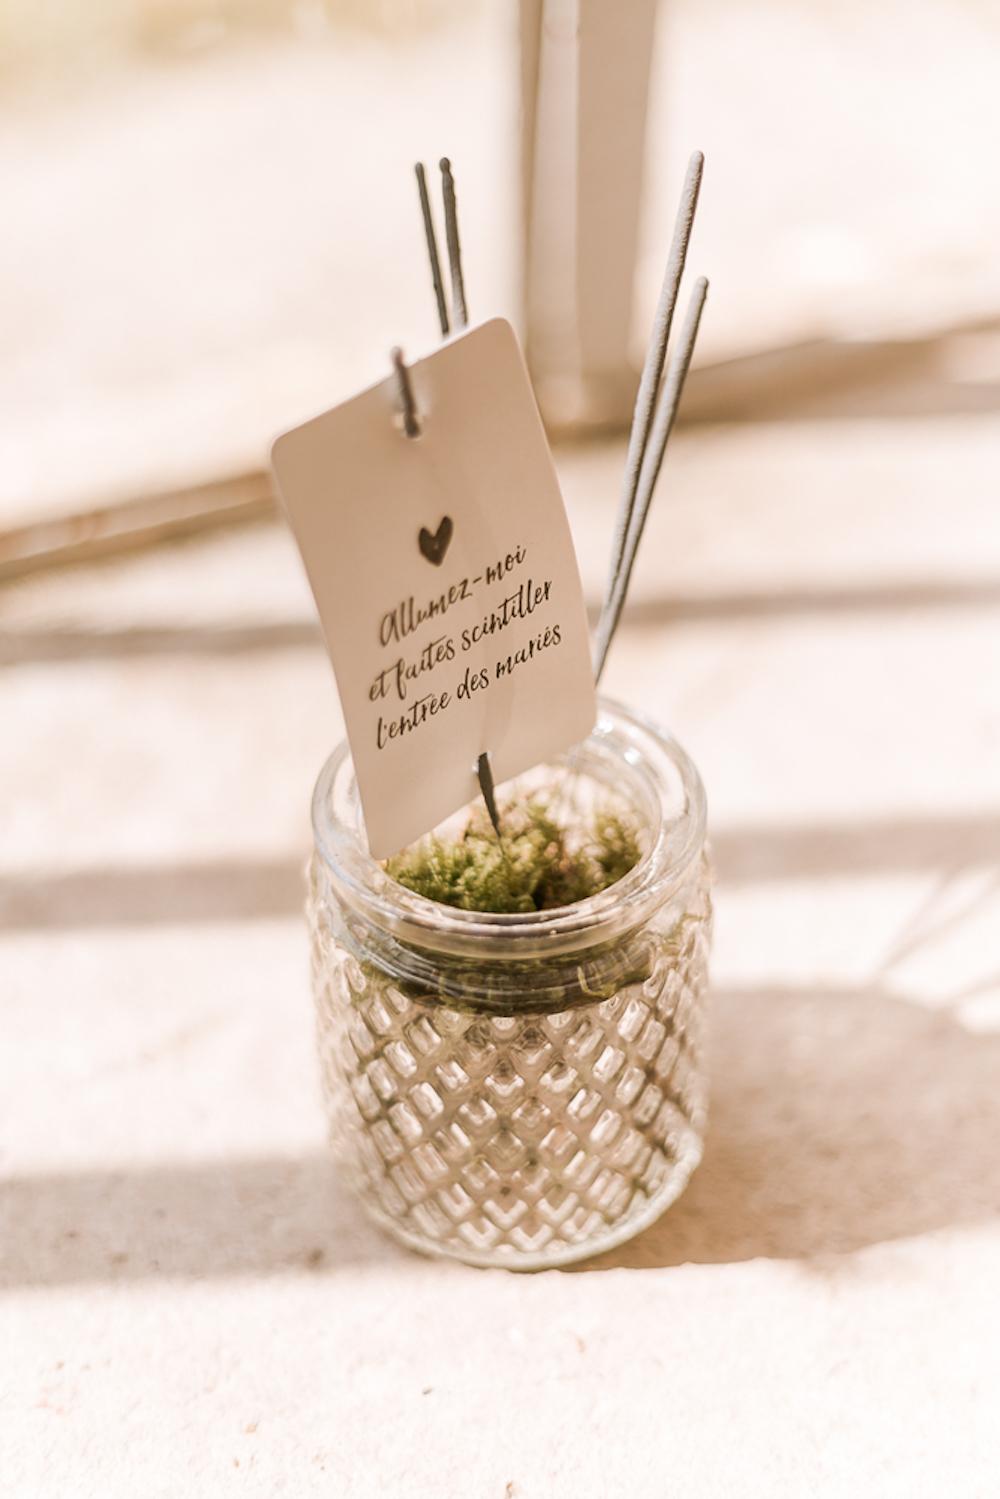 parisian-inspired-blog-mariage-shooting-inspiration-vegetal-abbaye-trois-fontaines-marne-cg-photographie-16.jpg